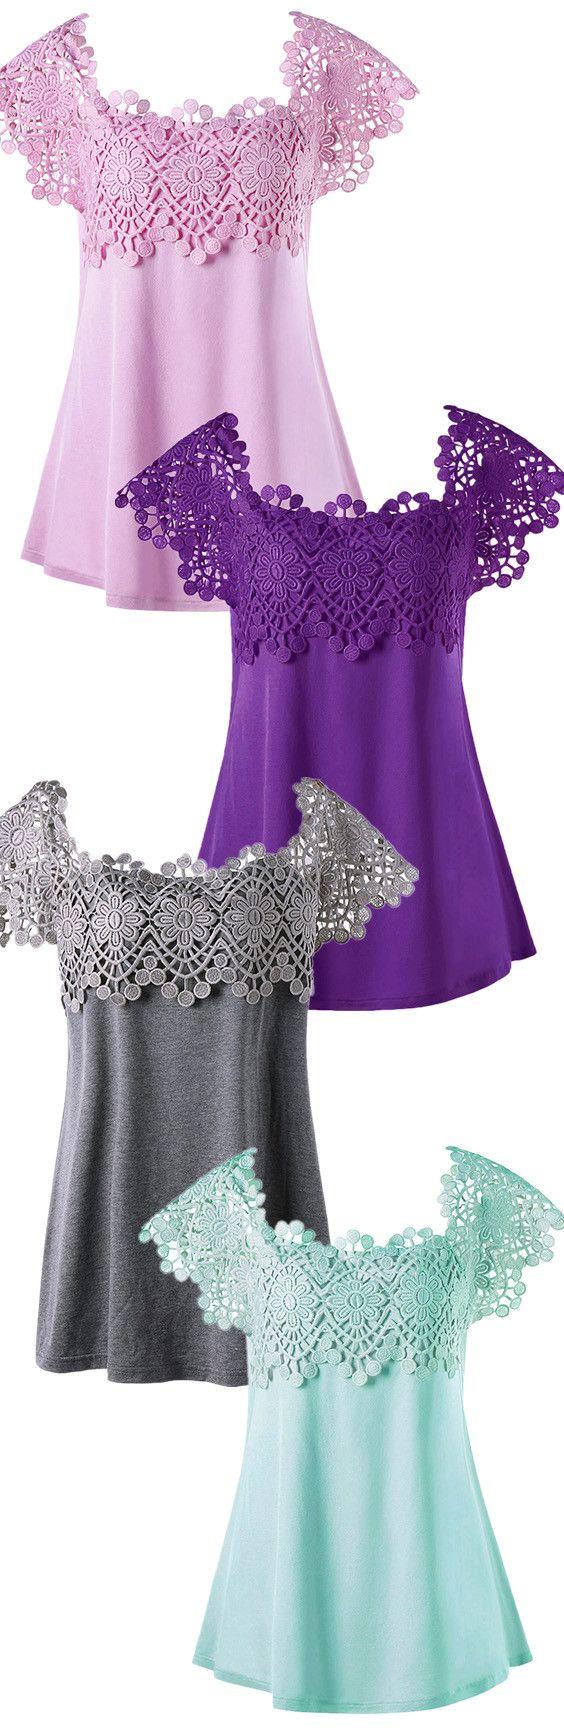 e255e4adbde top,crop top,tunic tops,lace top,womens tops,sequin top,womens ...